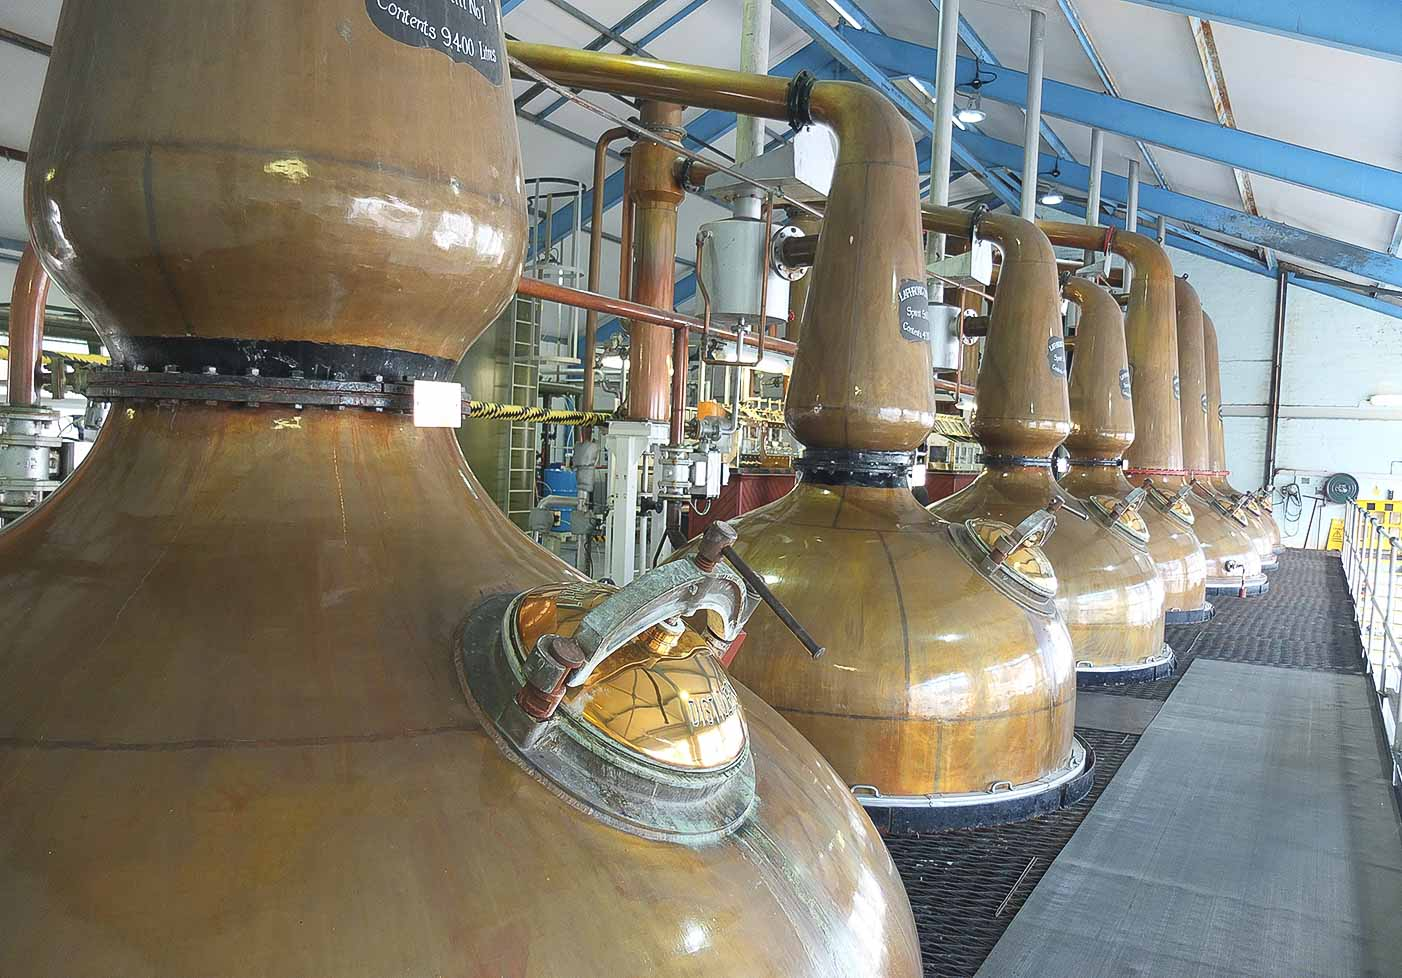 Jack Hyams - Distillery Equipment Manufacturers